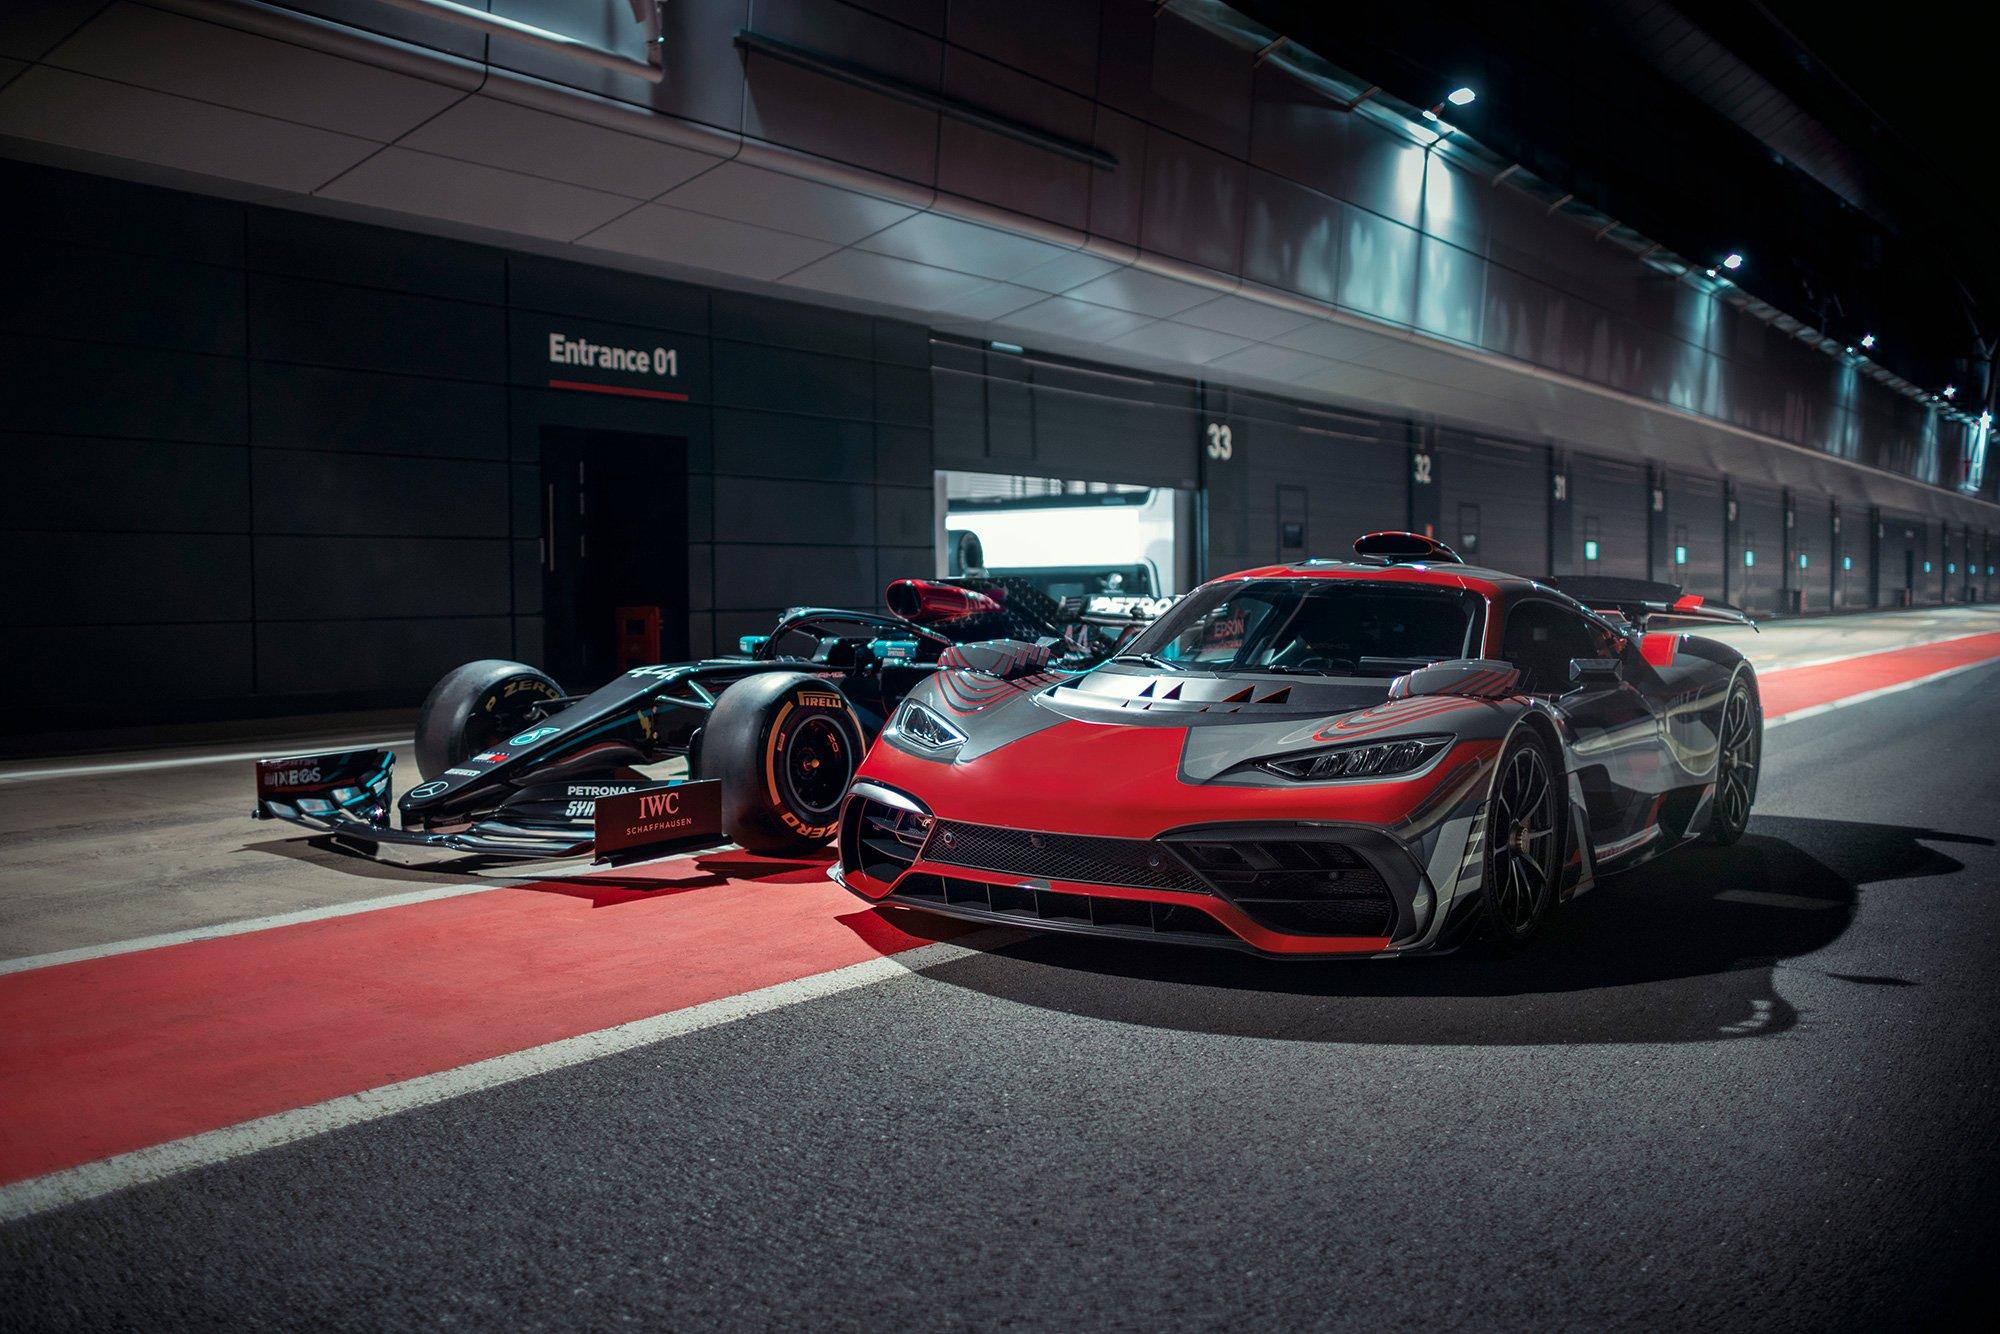 Campana Mercedes-AMG Project One Hamilton